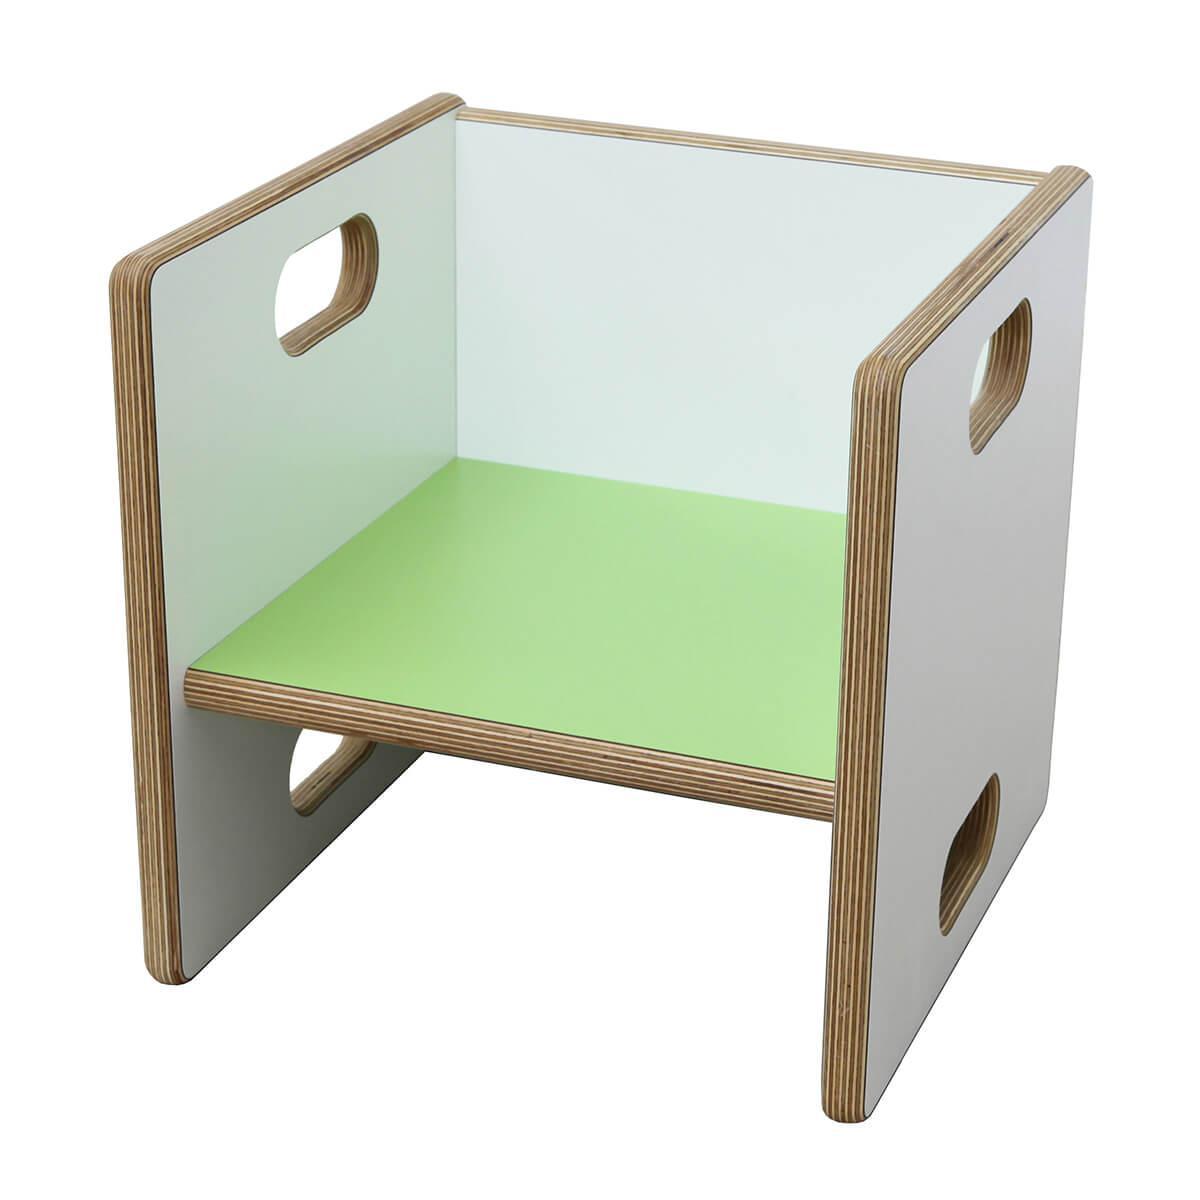 Wandelstuhl DECOR Debreuyn Multiplex weiß HPL - Sitzfläche lindgrün